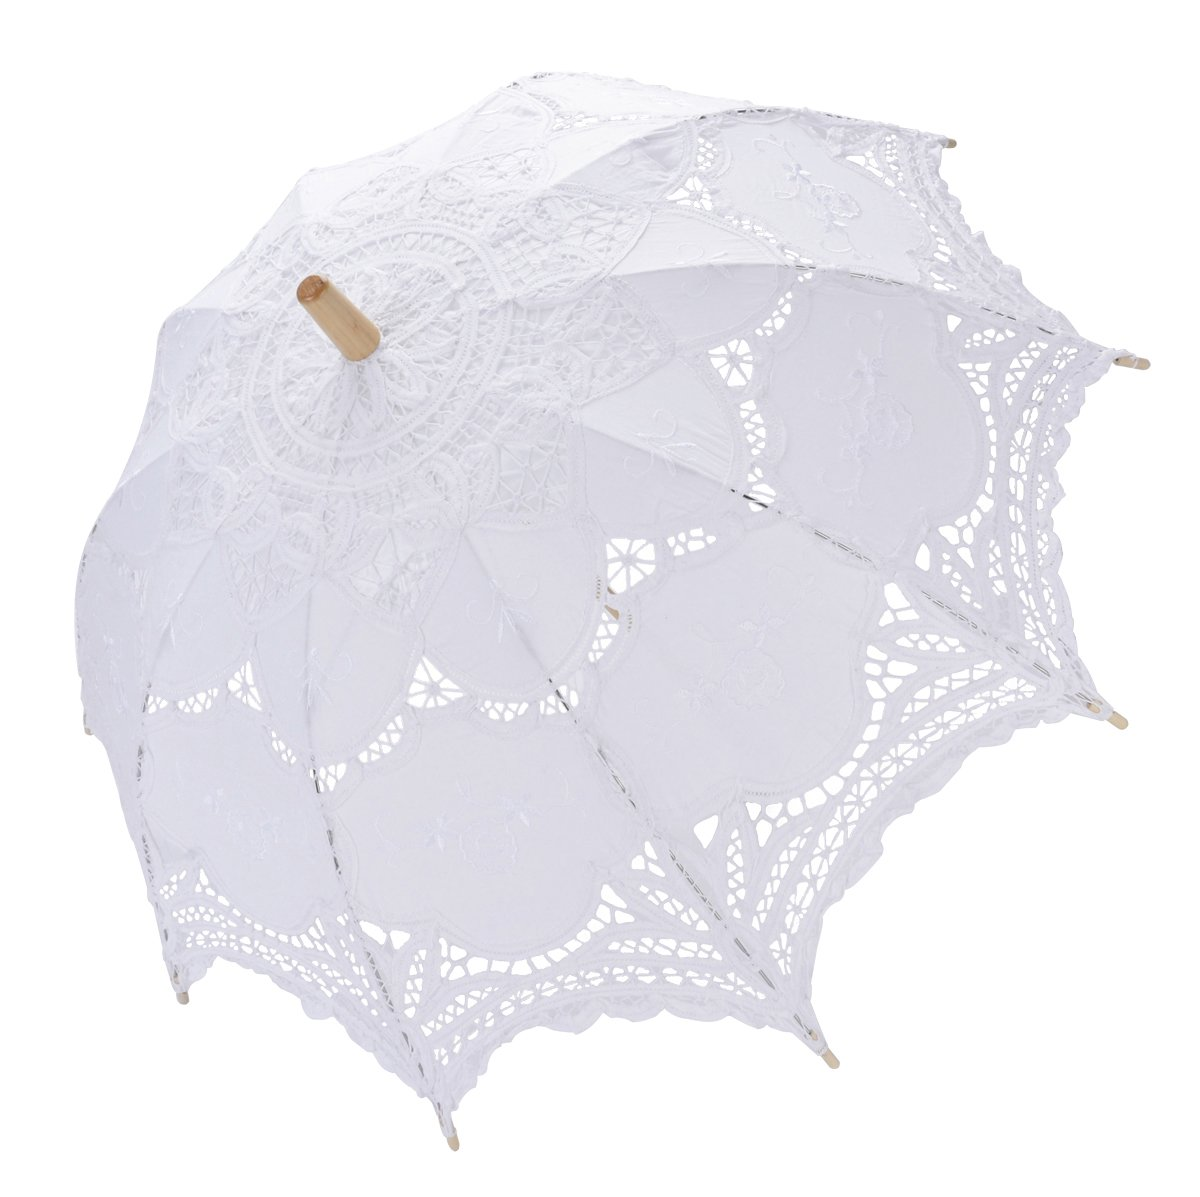 Tinksky Lace Umbrella Parasol Romantic Wedding Umbrella Photograph (White)